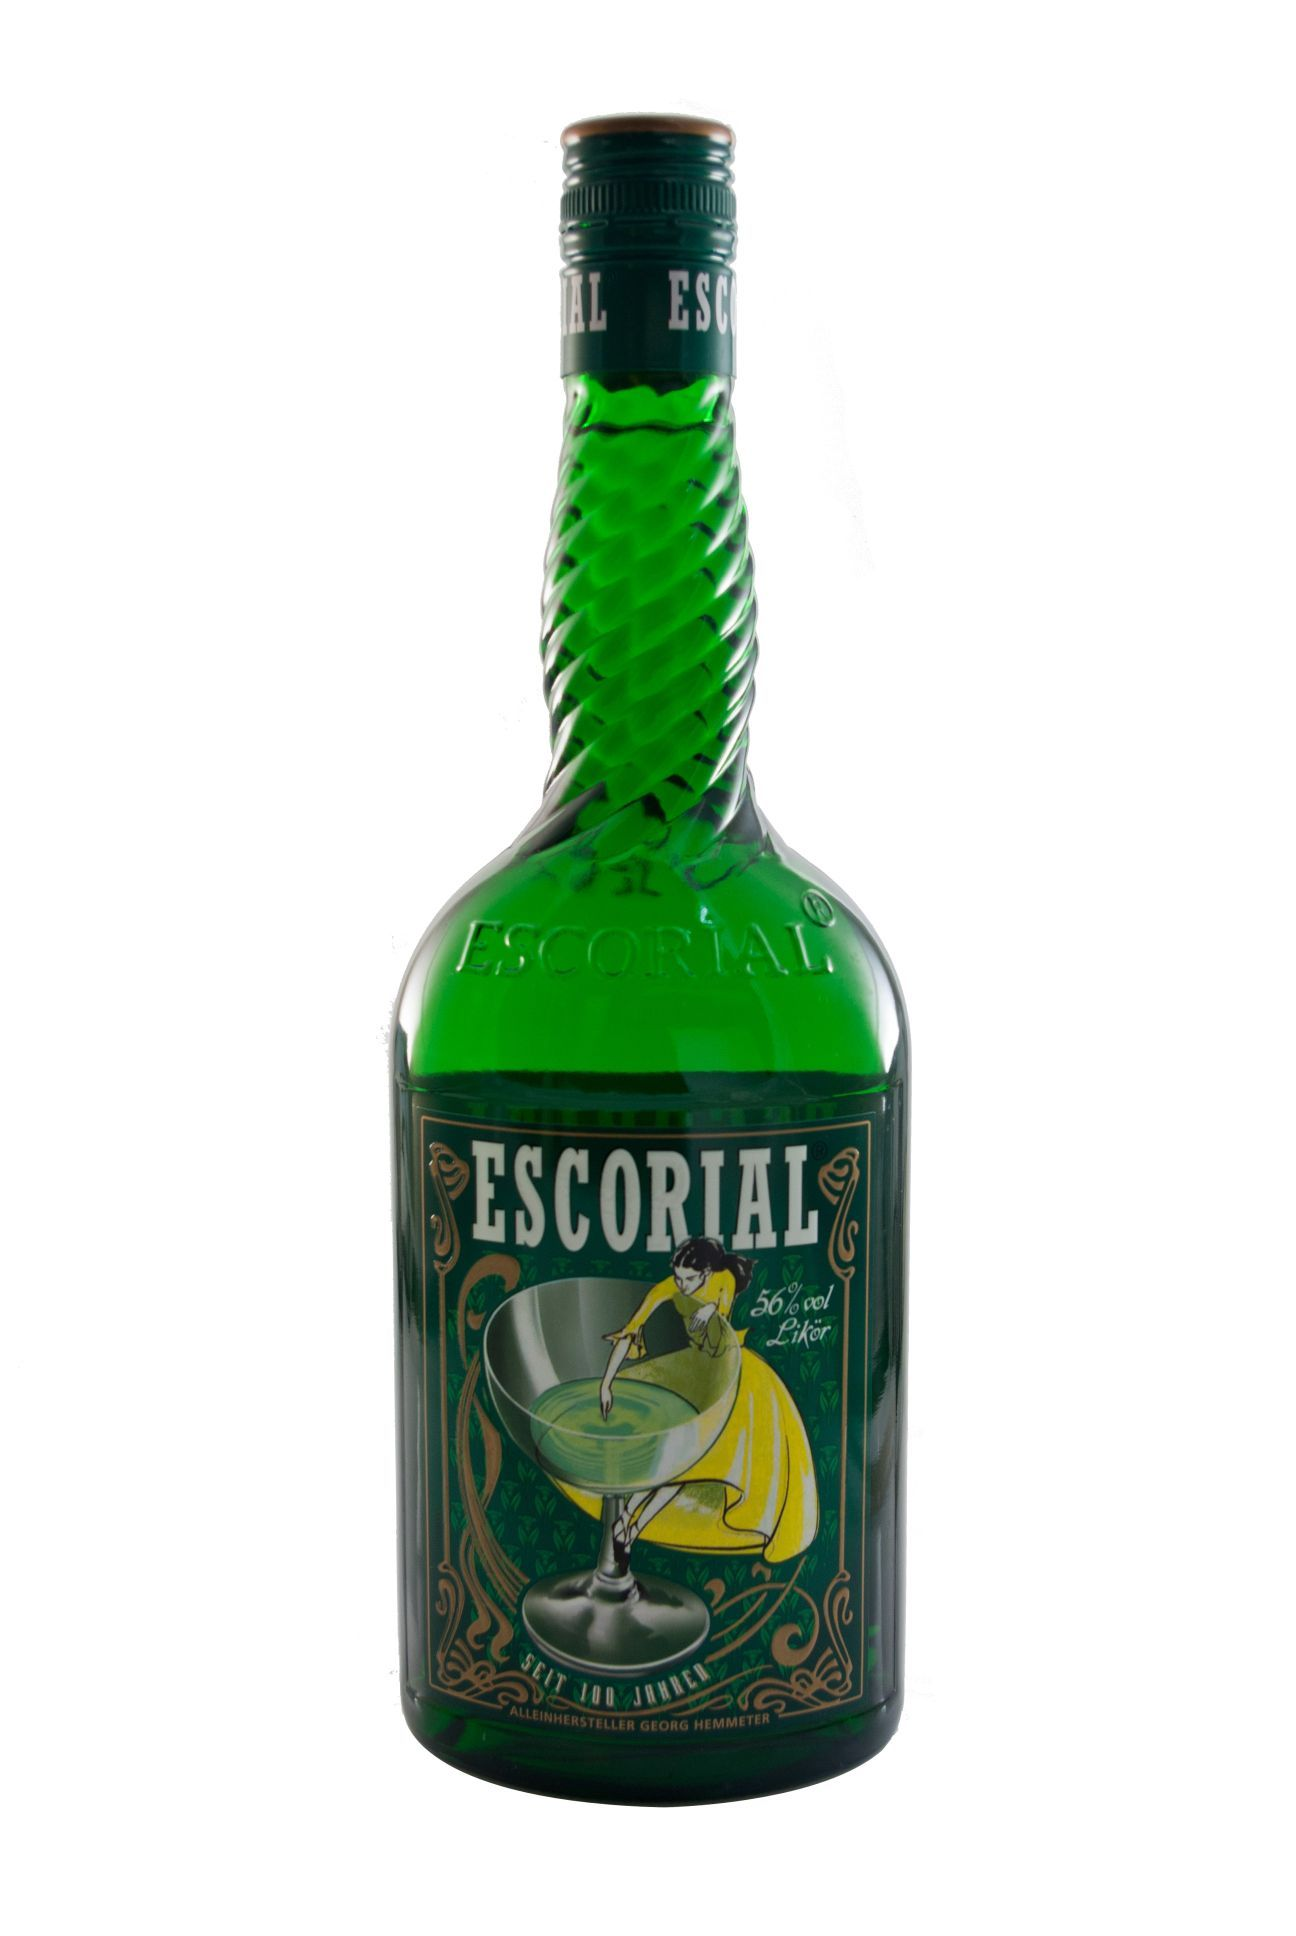 Escorial Grün / 56 vol (0,7L) Bottle, Drinks, Champagne